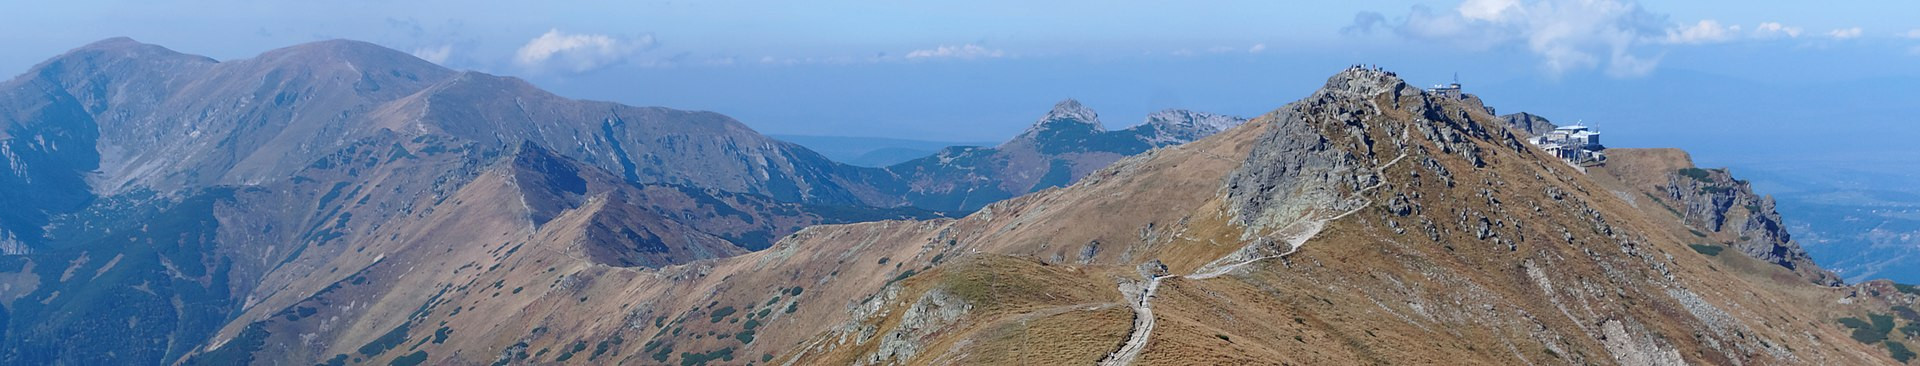 2560px-Carpathian_banner_Liliowe_Pass_in